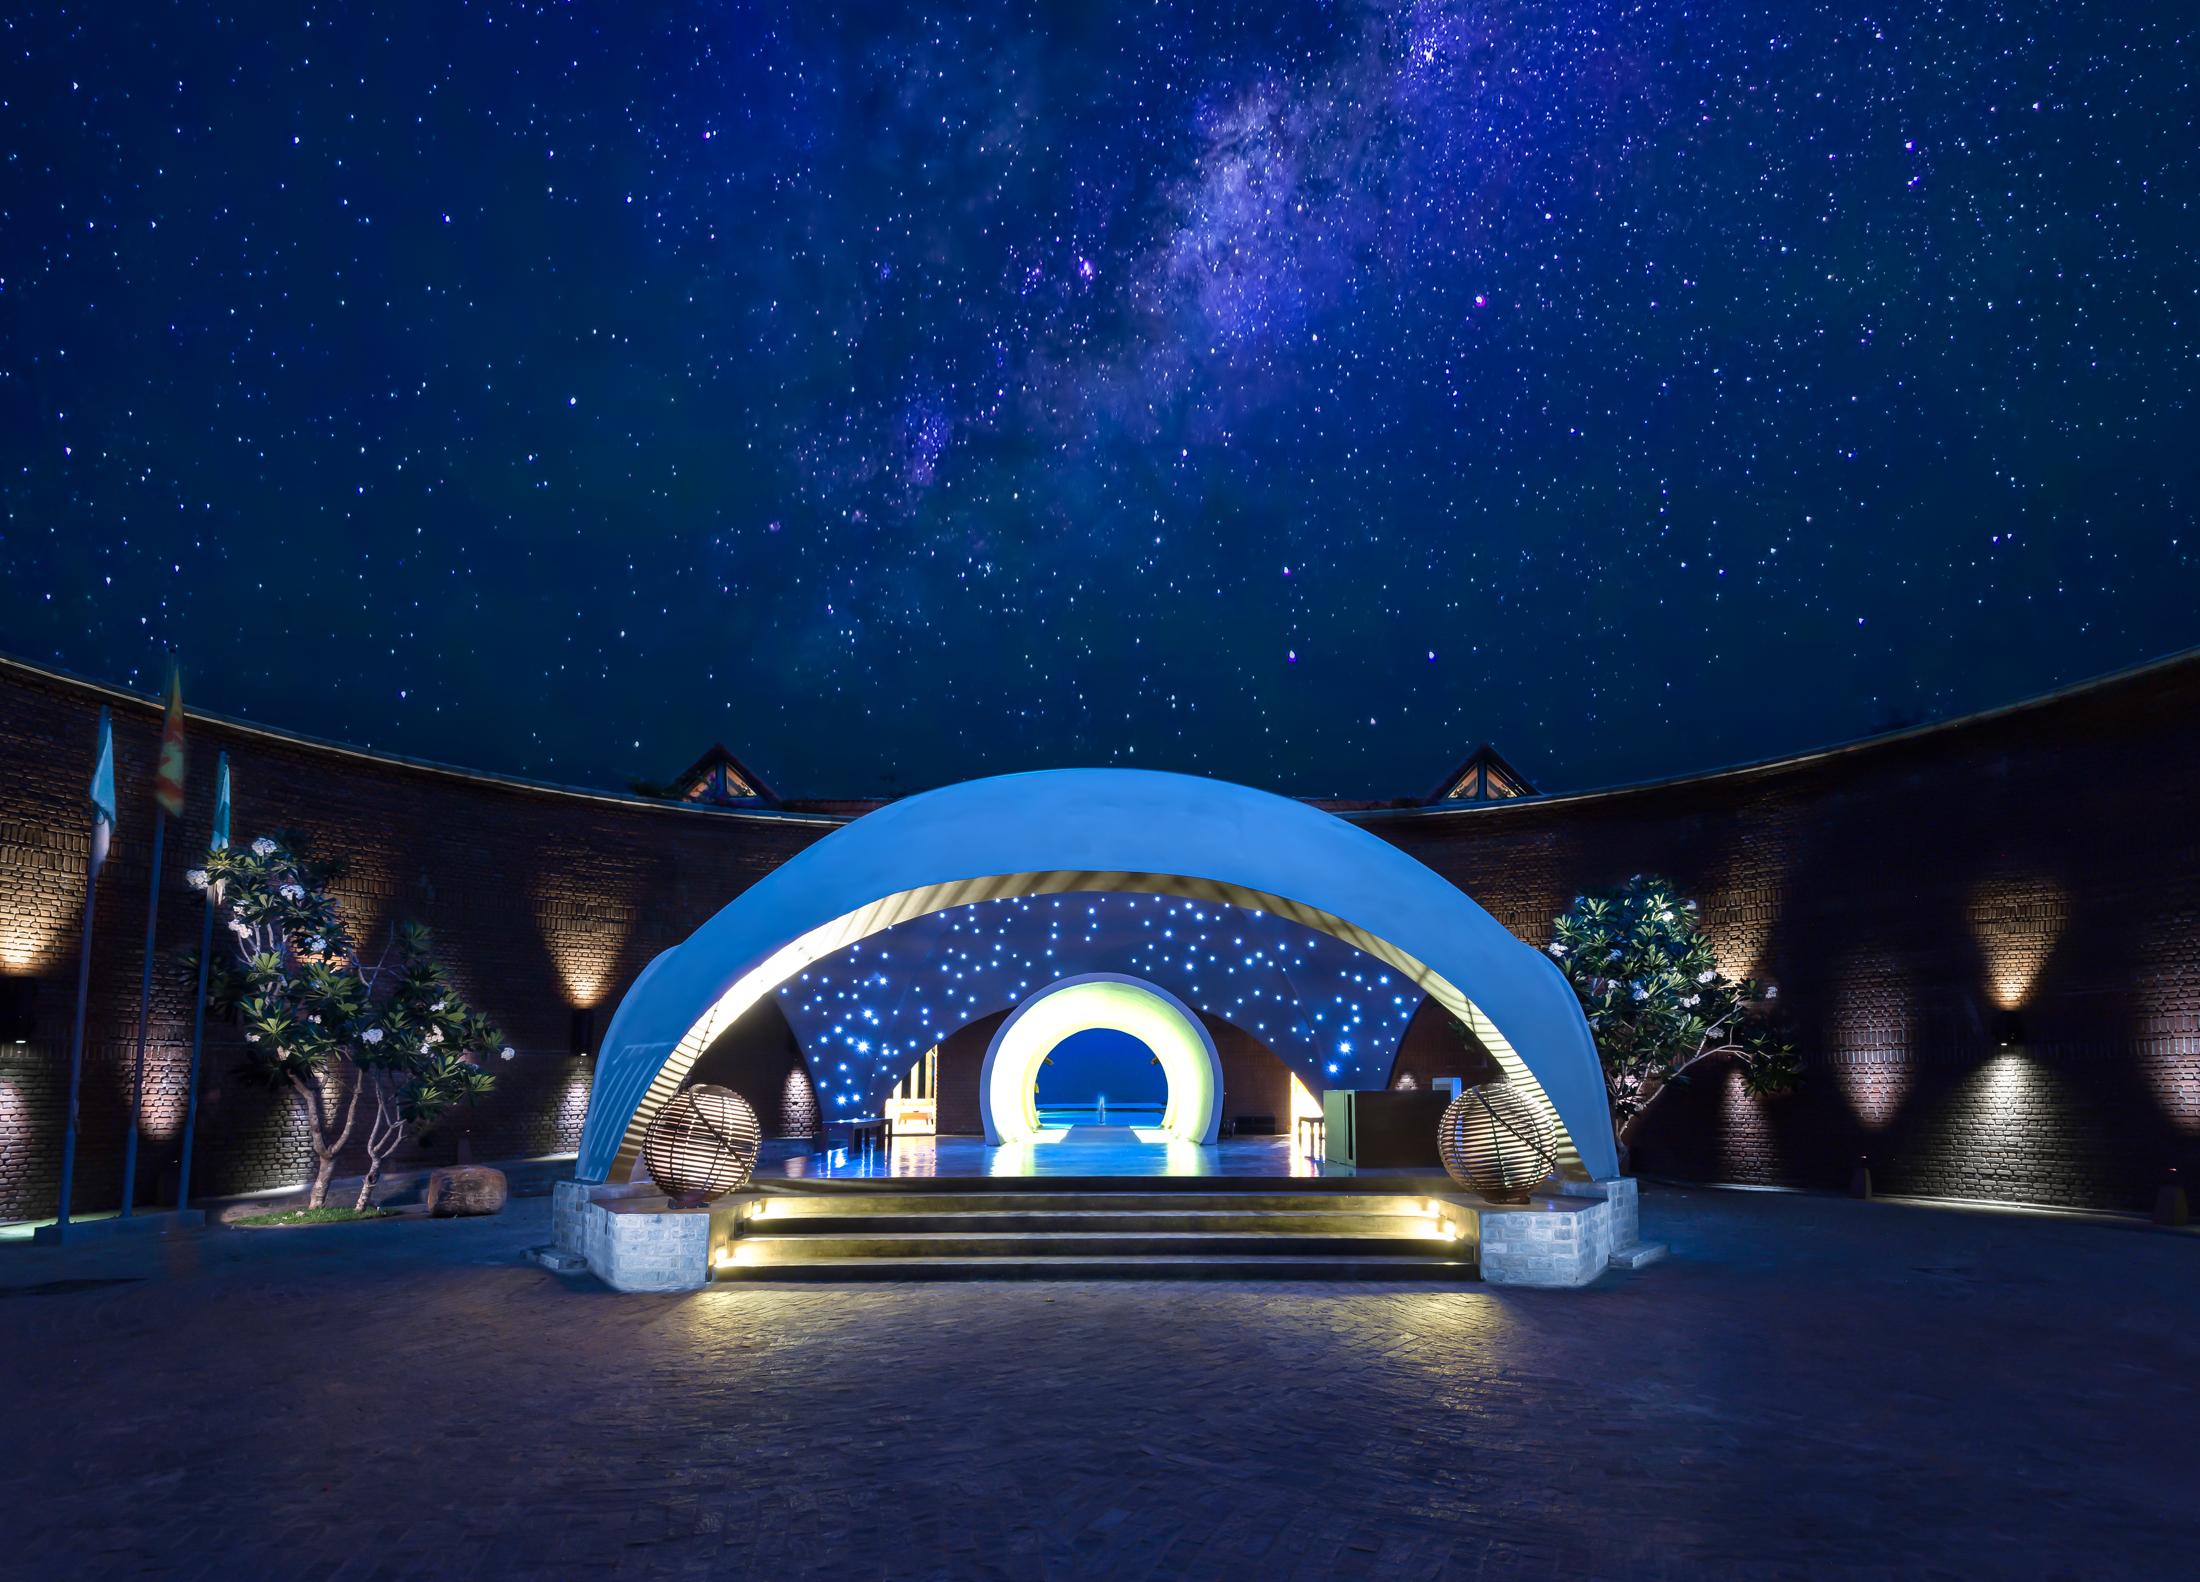 UgaBay-Entrance-Moonlight-fixed-BrandingFree-MidRes.jpg